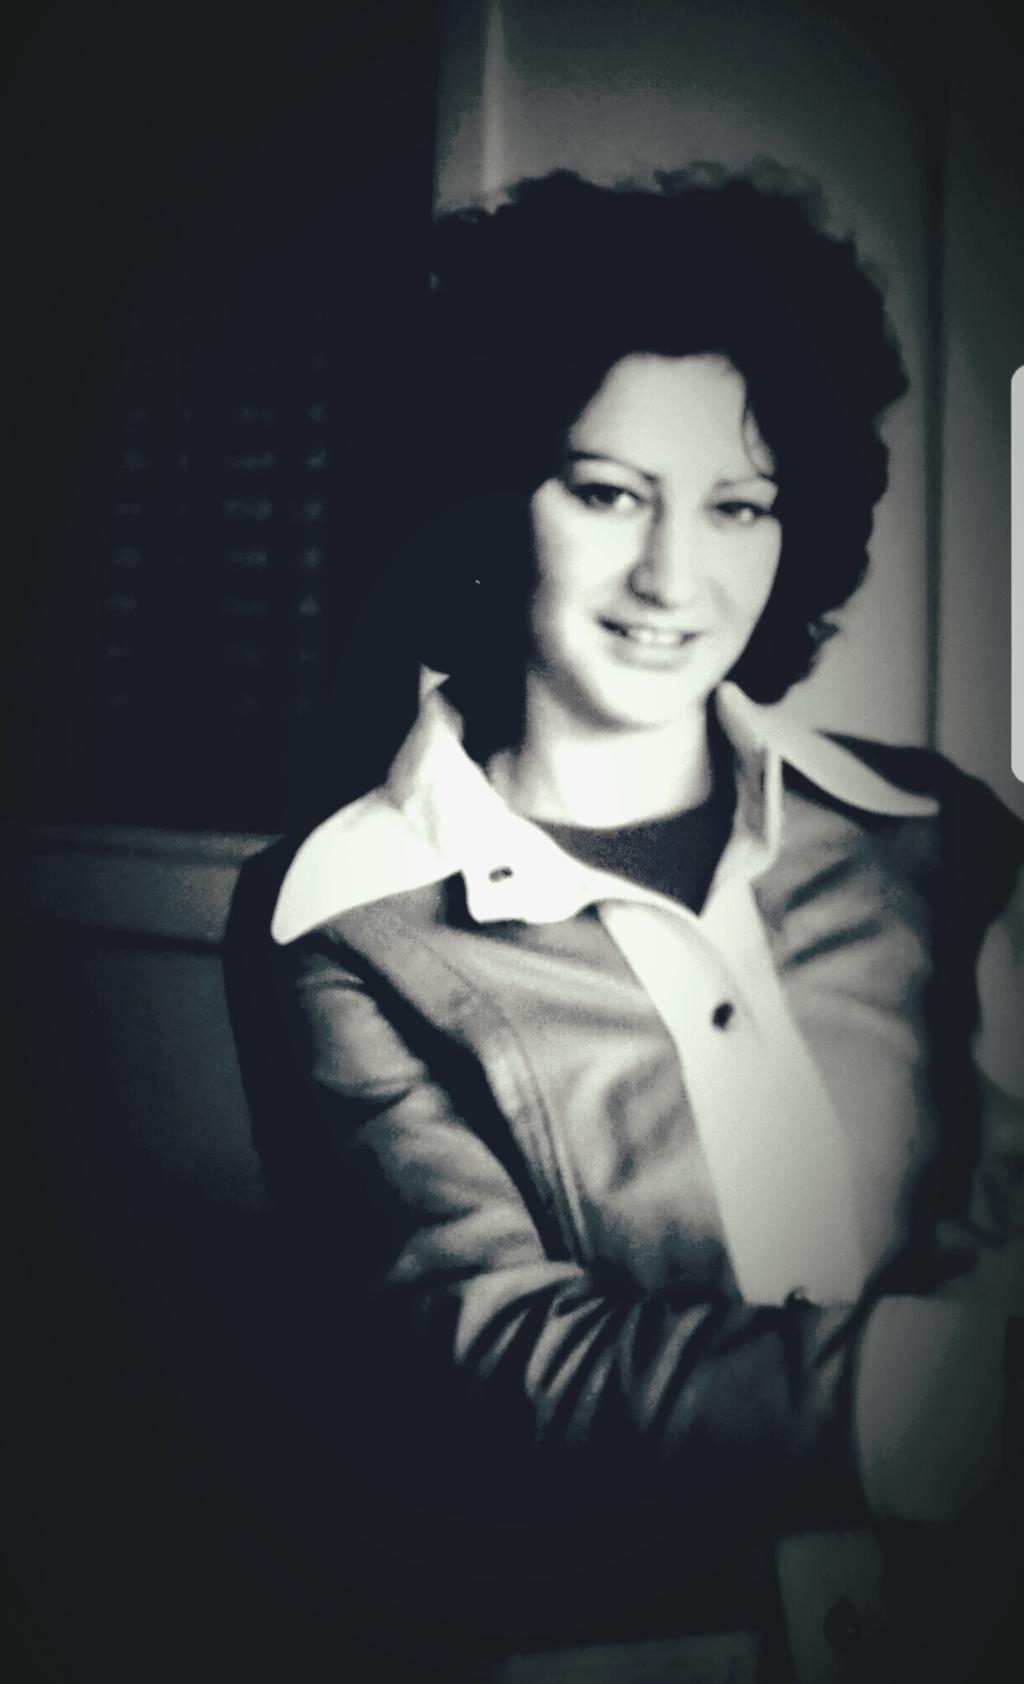 Adrian Simon's mother Jan